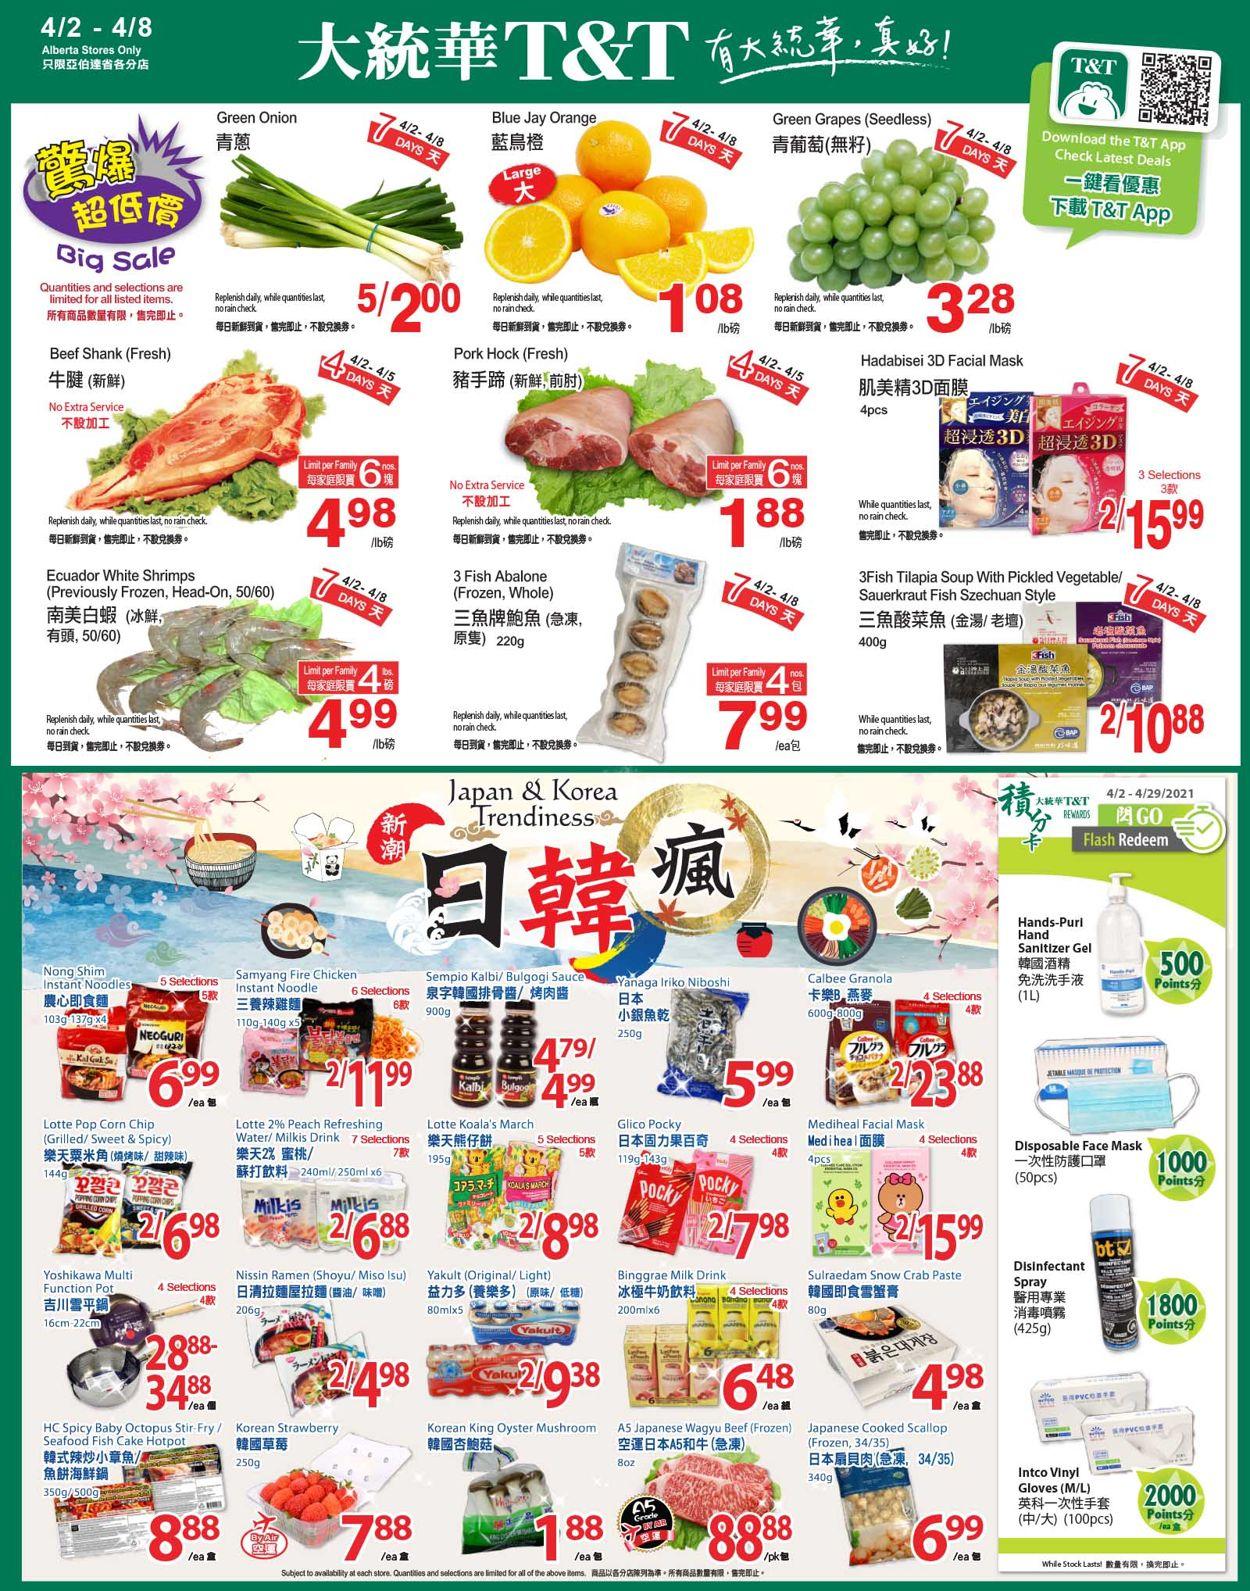 T&T Supermarket - Alberta Flyer - 04/02-04/08/2021